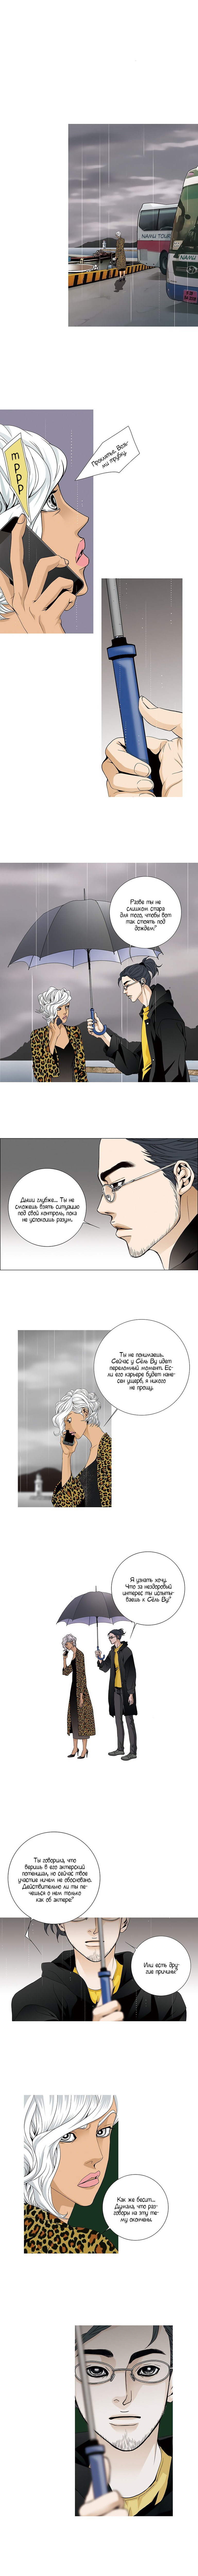 https://r1.ninemanga.com/comics/pic2/29/28573/344340/151207878895.jpg Page 2